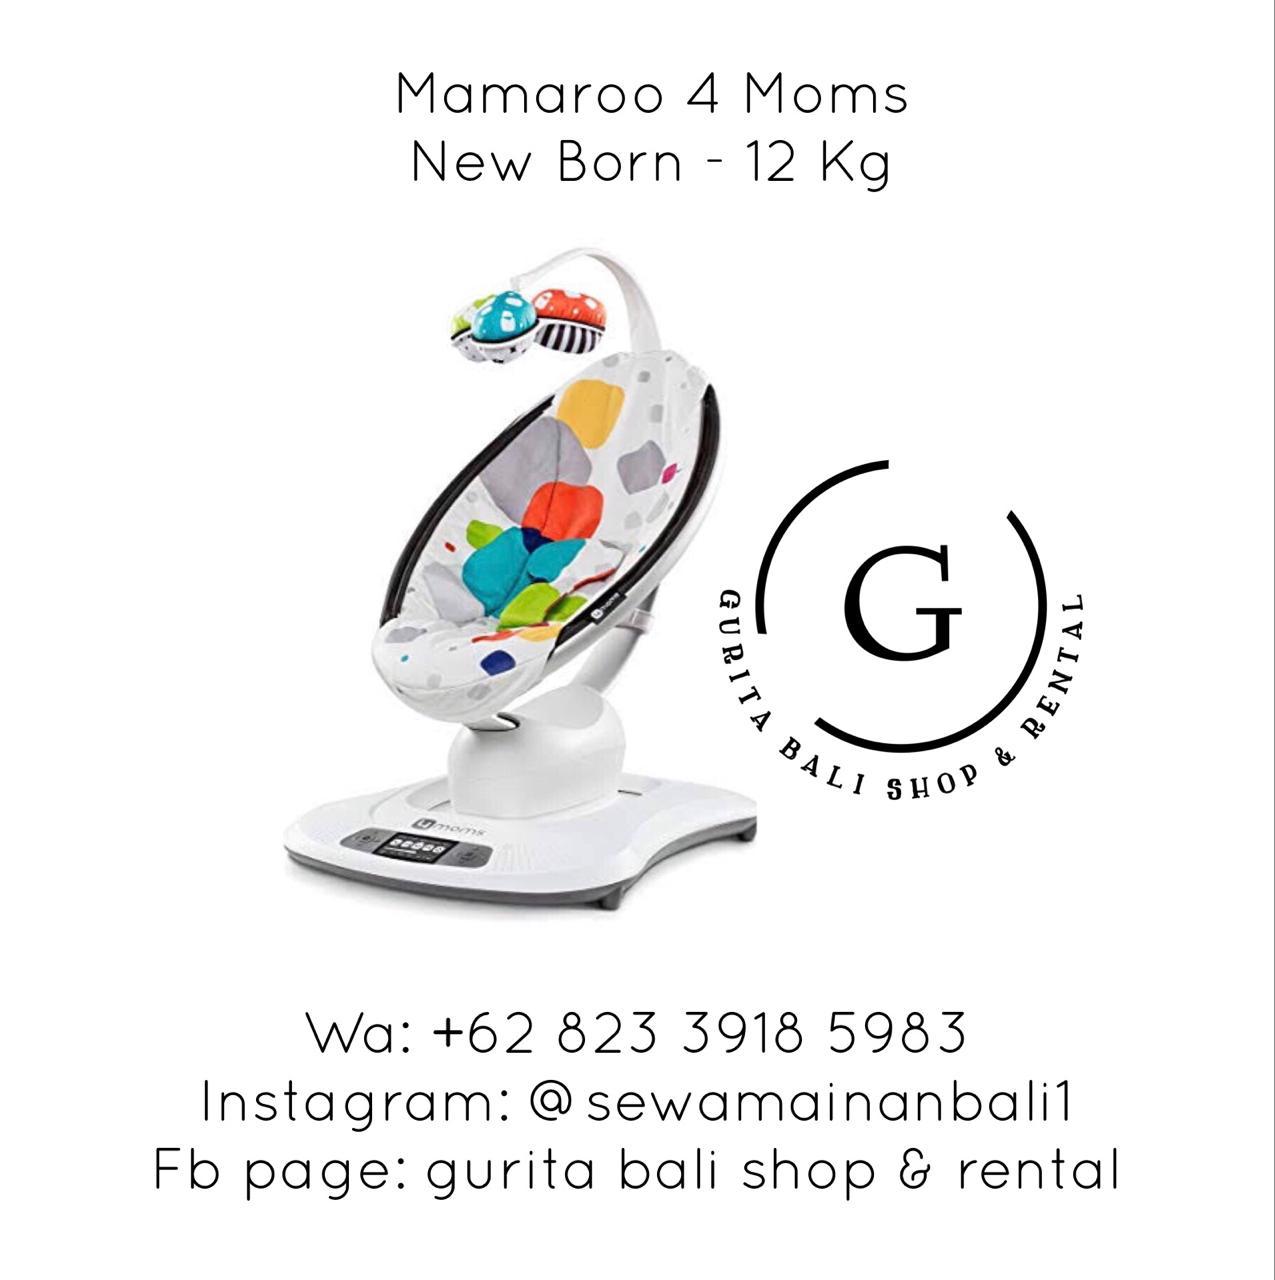 MAMAROO 4MOMS